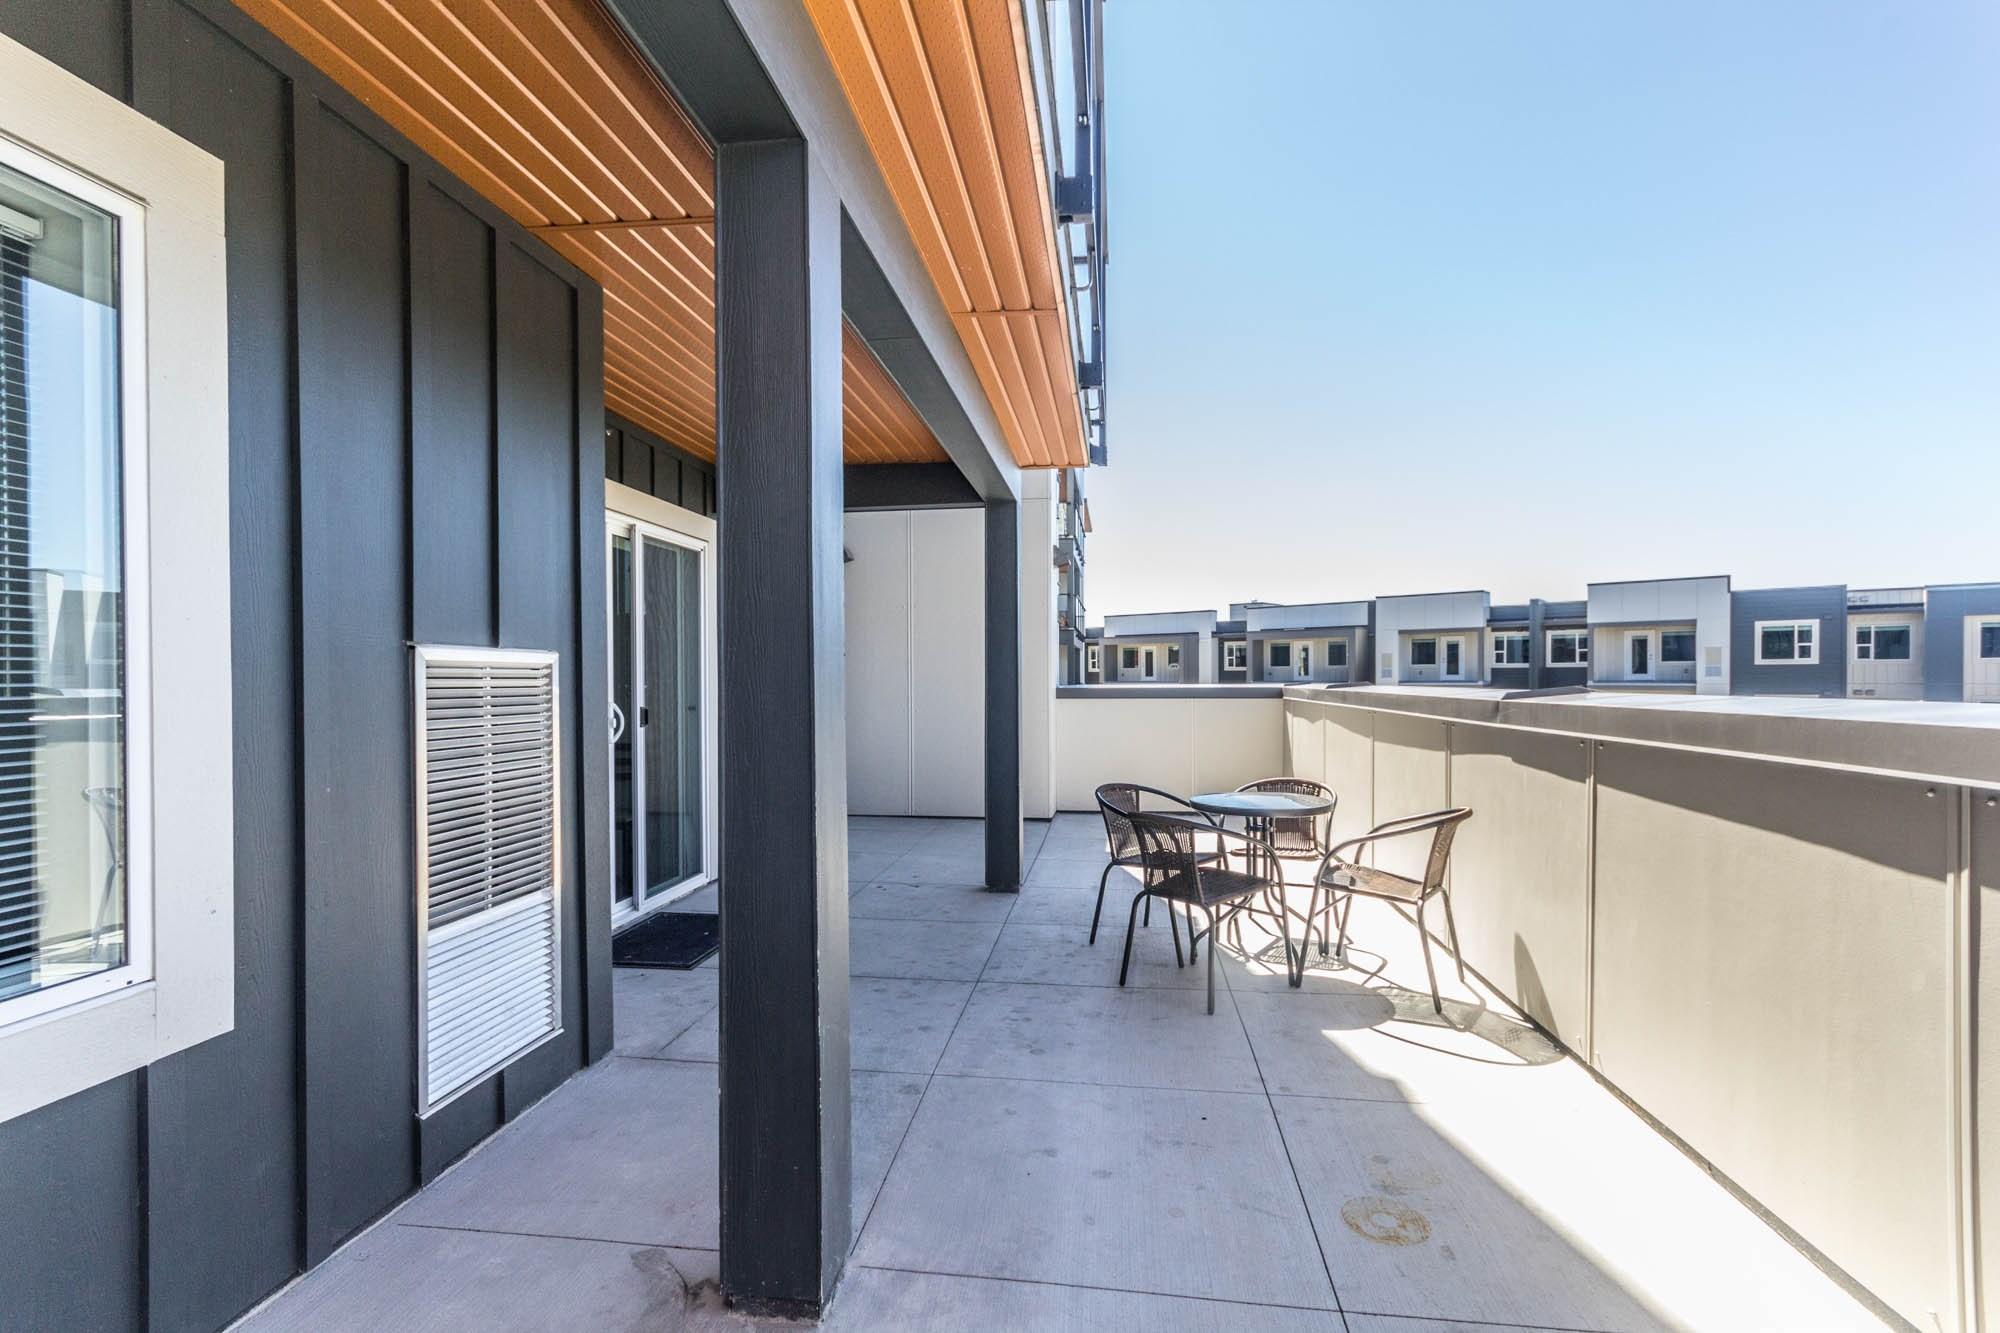 775-academy-way-u-three-ubco-kelowna-investment-property-patio.Jpg